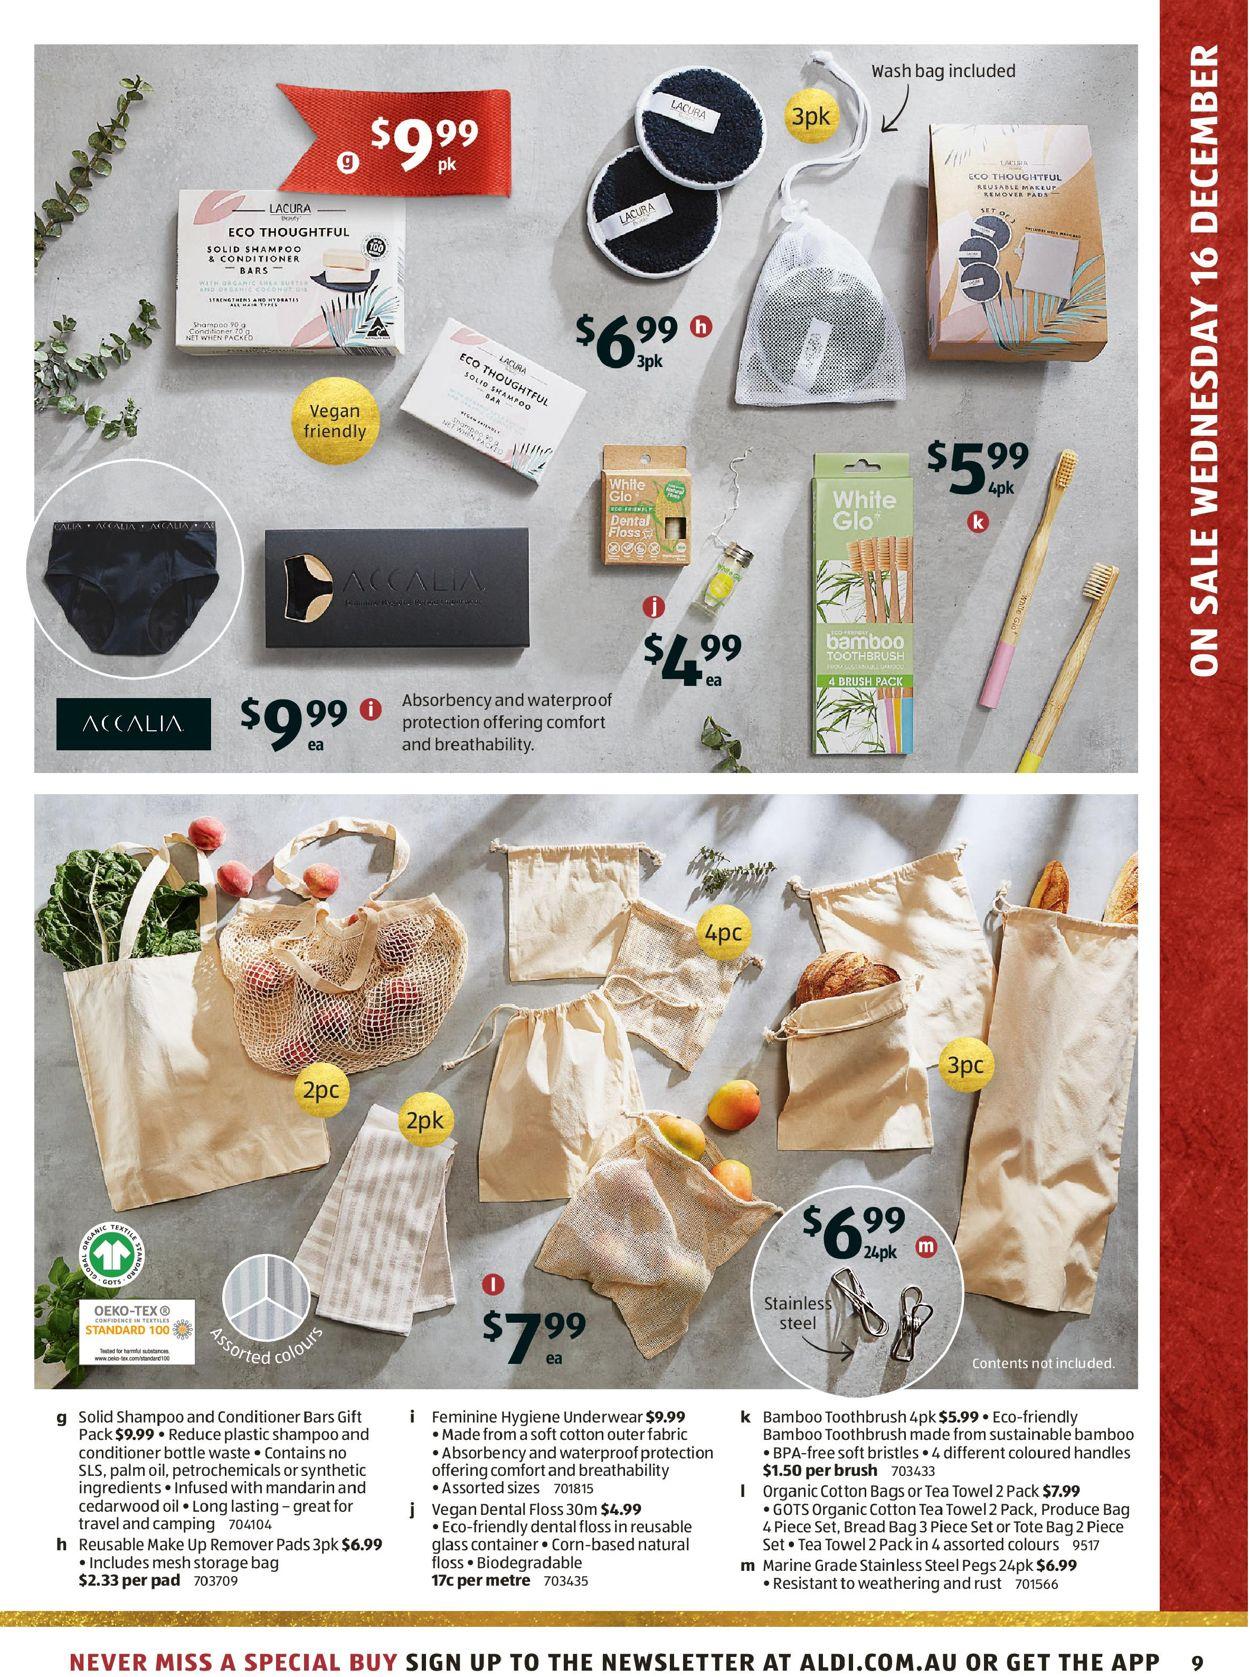 ALDI - Holiday 2020 Catalogue - 16/12-22/12/2020 (Page 9)